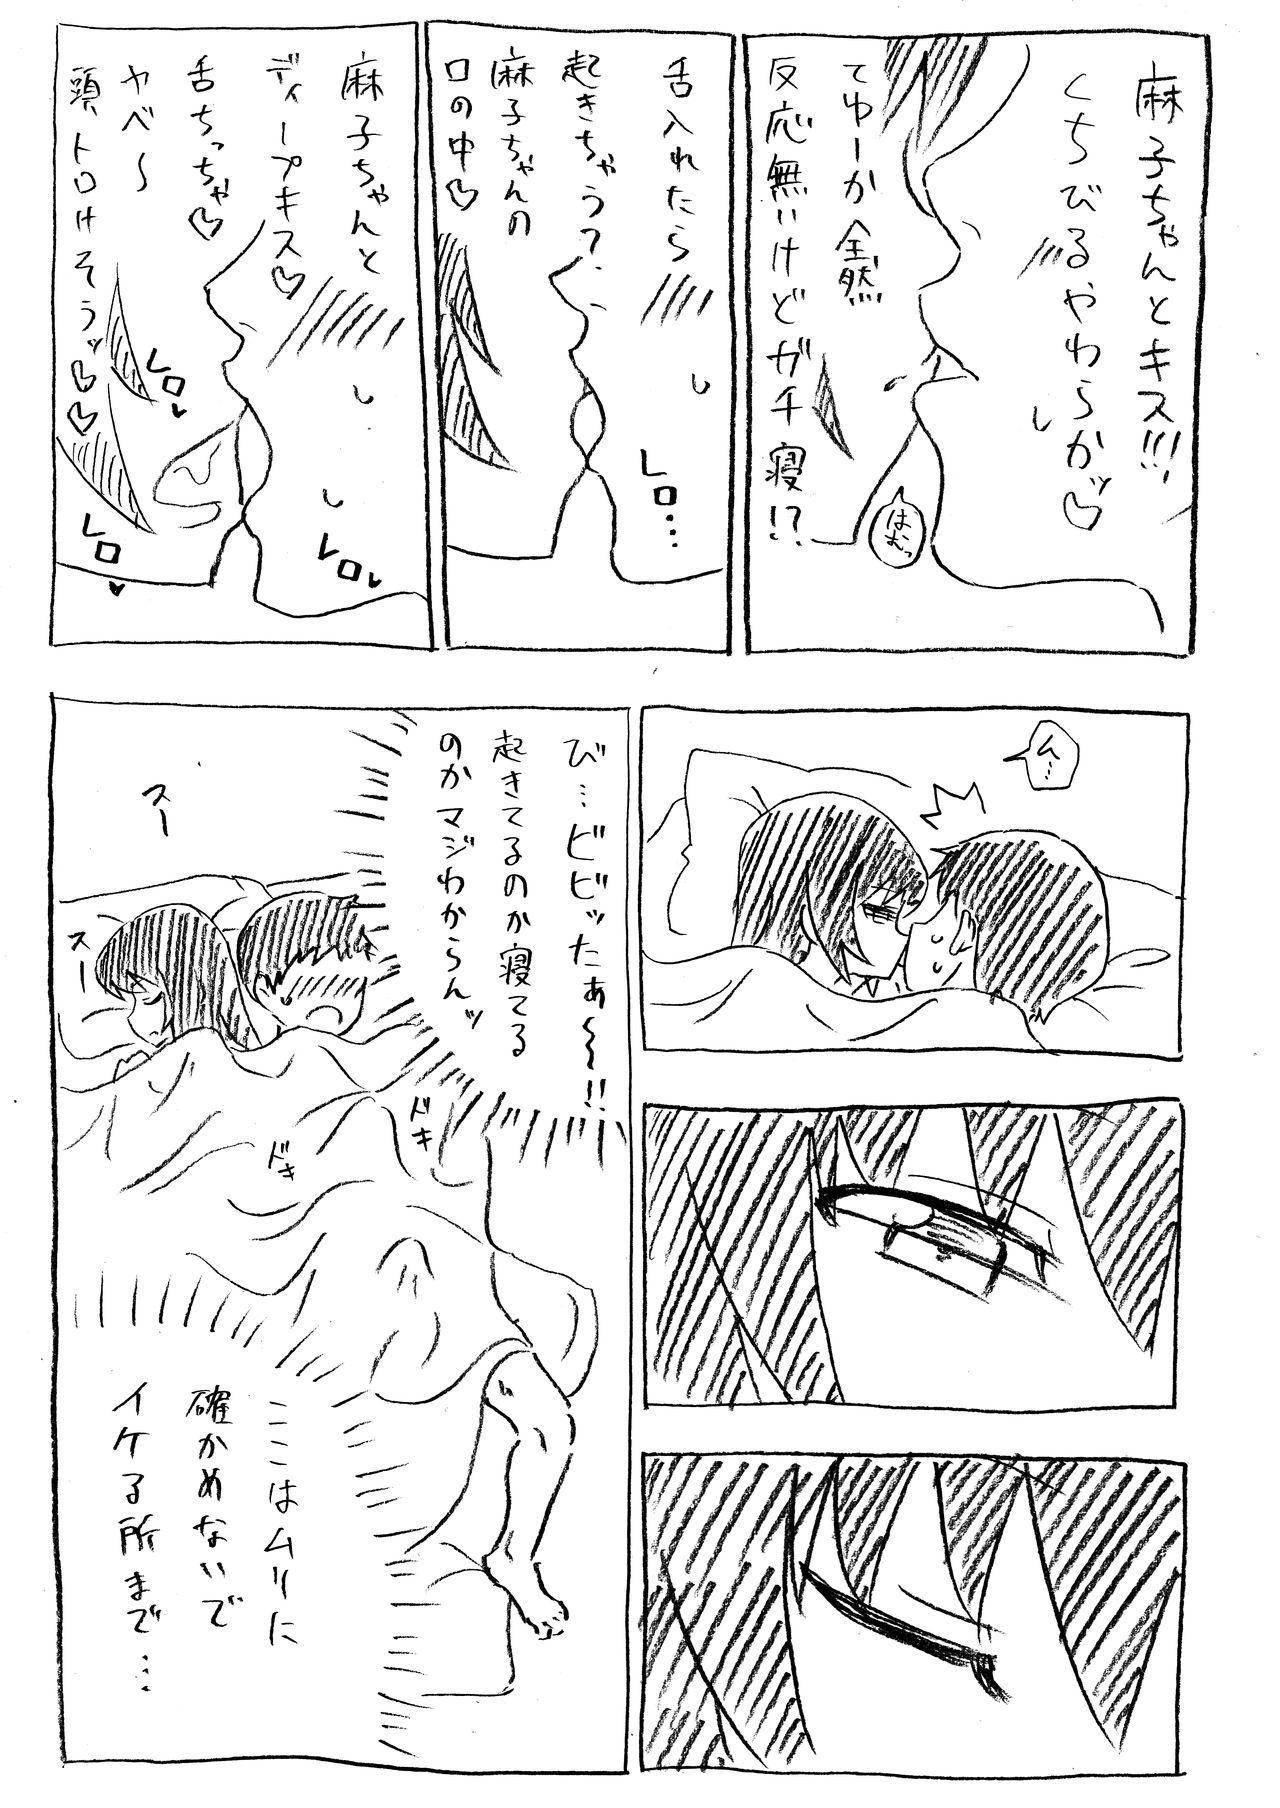 Mako-chan to Ofuron Asedaku Sex 4